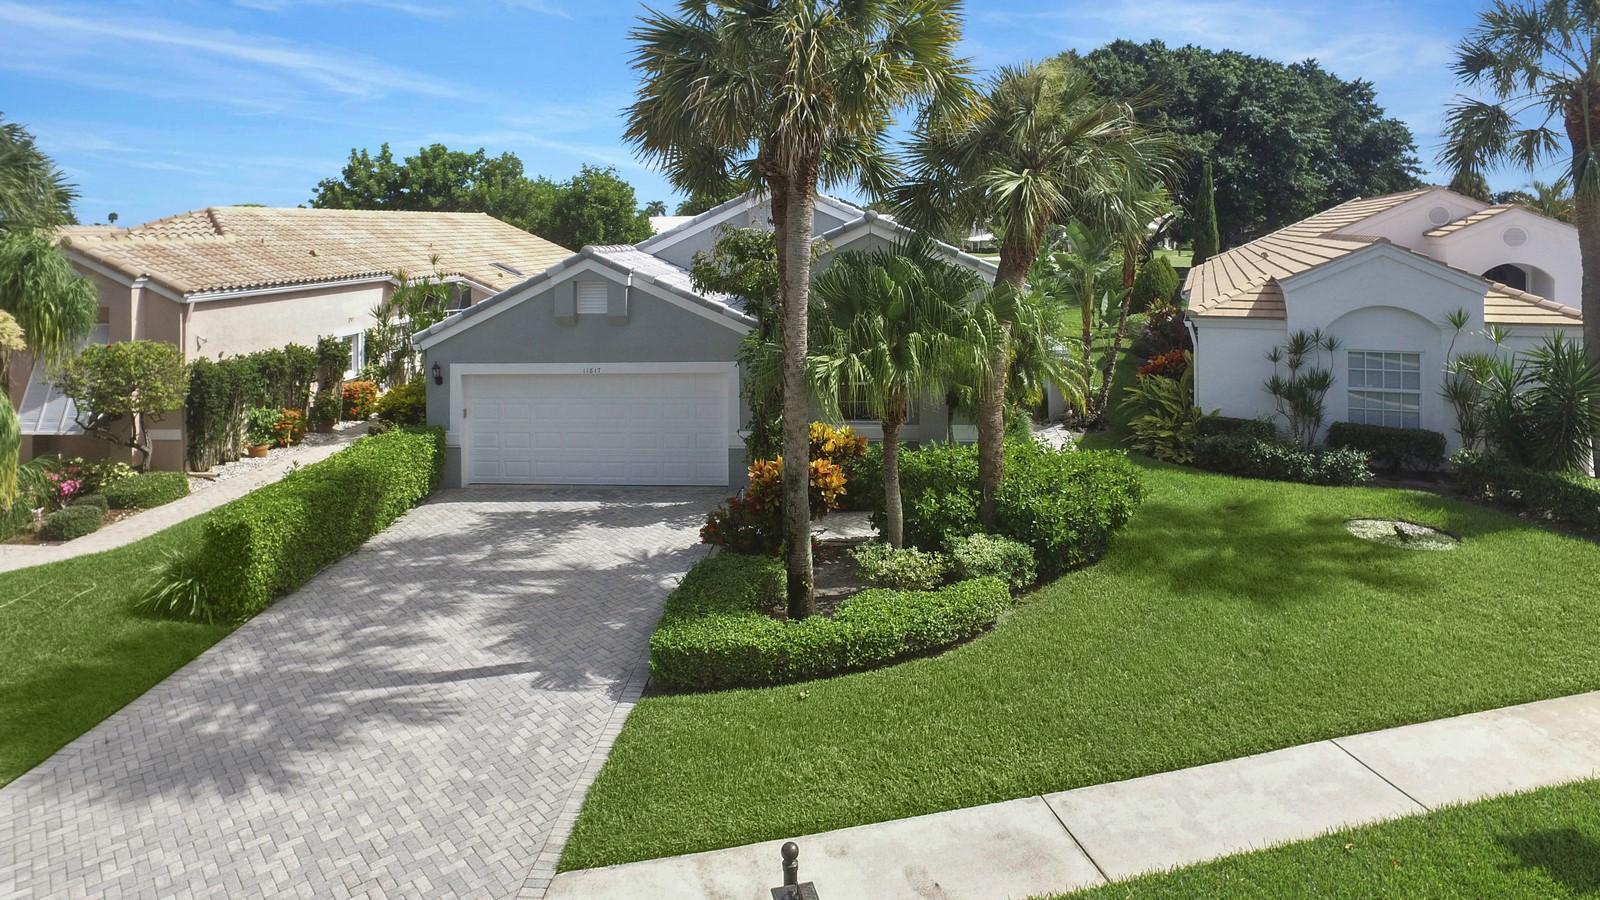 11817 Fountainside Circle Boynton Beach, FL 33437 photo 1